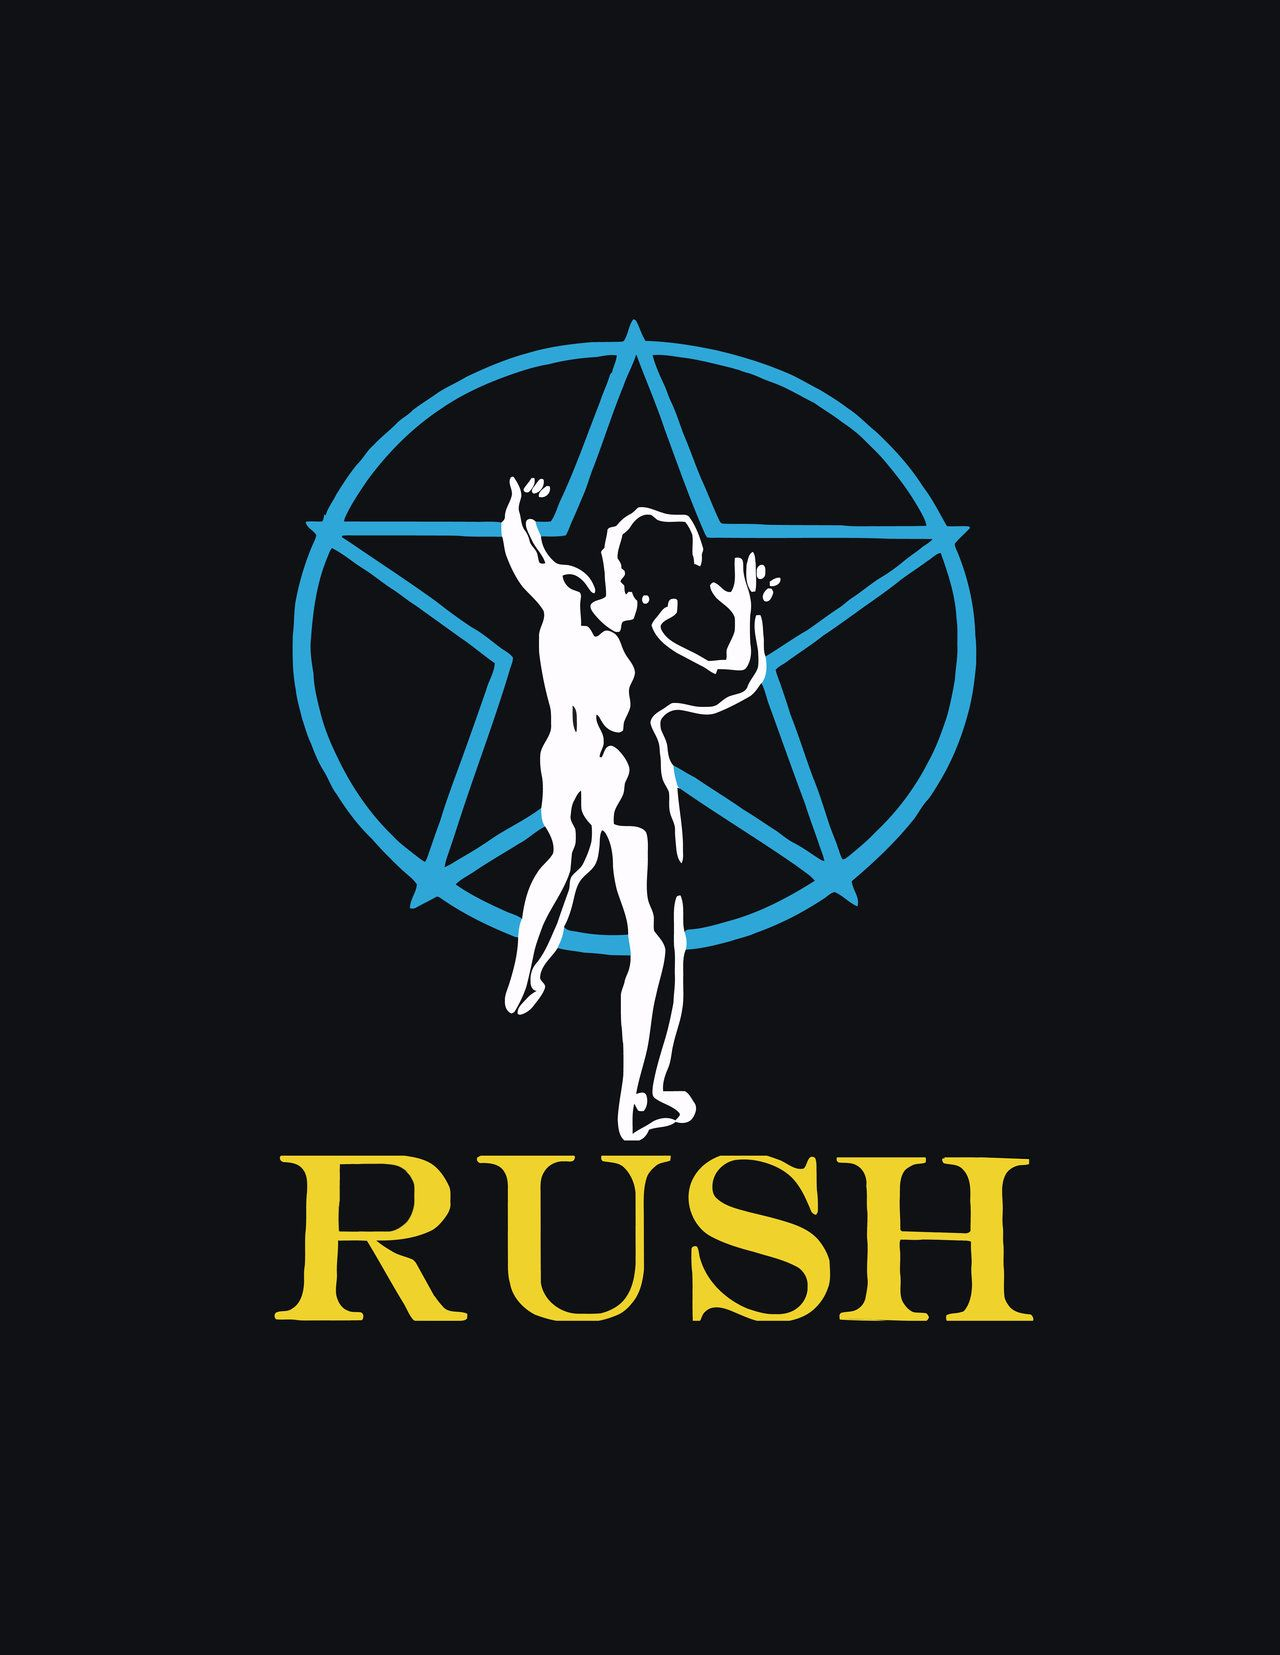 Rush logo 2010 2013 alvarock01 rush s starman this band logo is one of